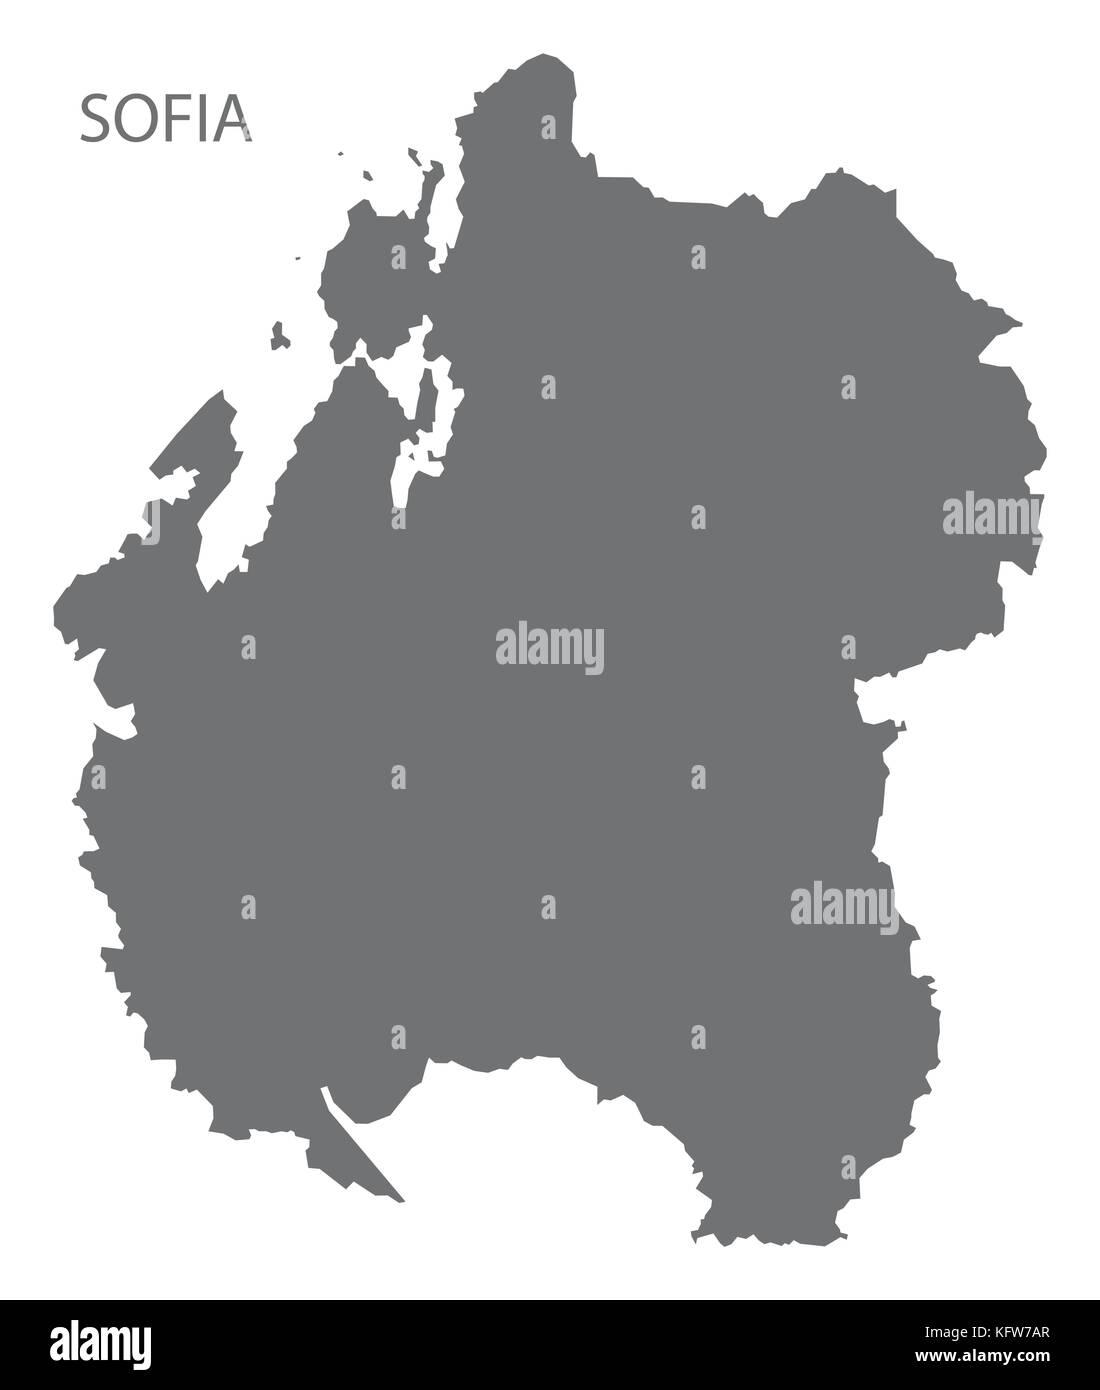 Sofia region map of Madagascar grey illustration silhouette shape Stock Vector